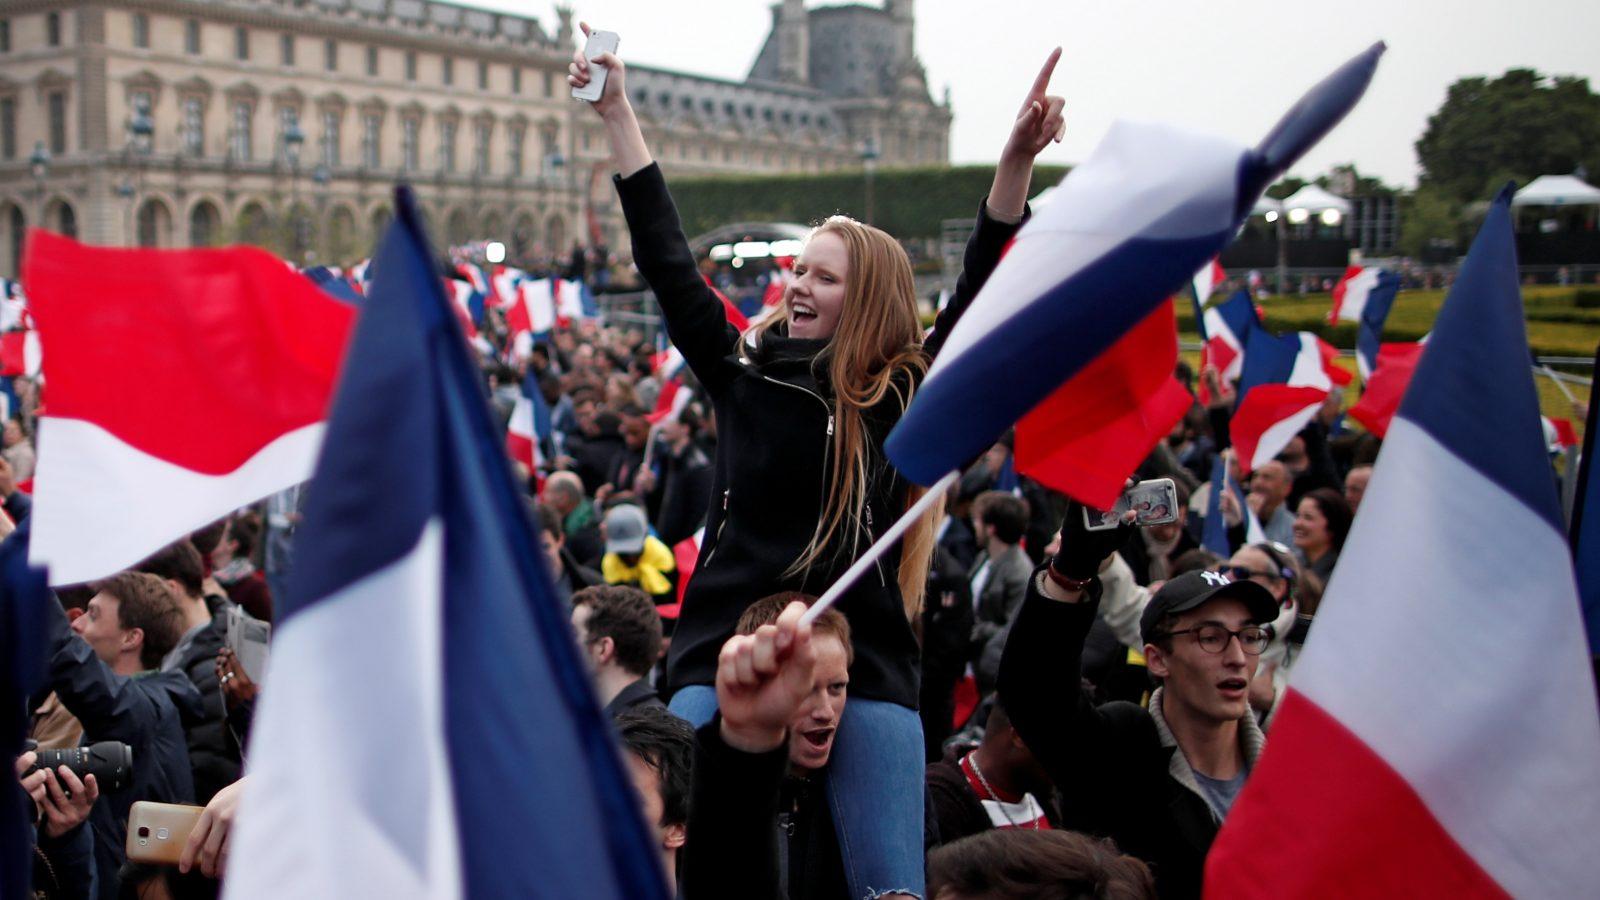 Supporters of Emmanuel Macron celebrate near the Louvre.